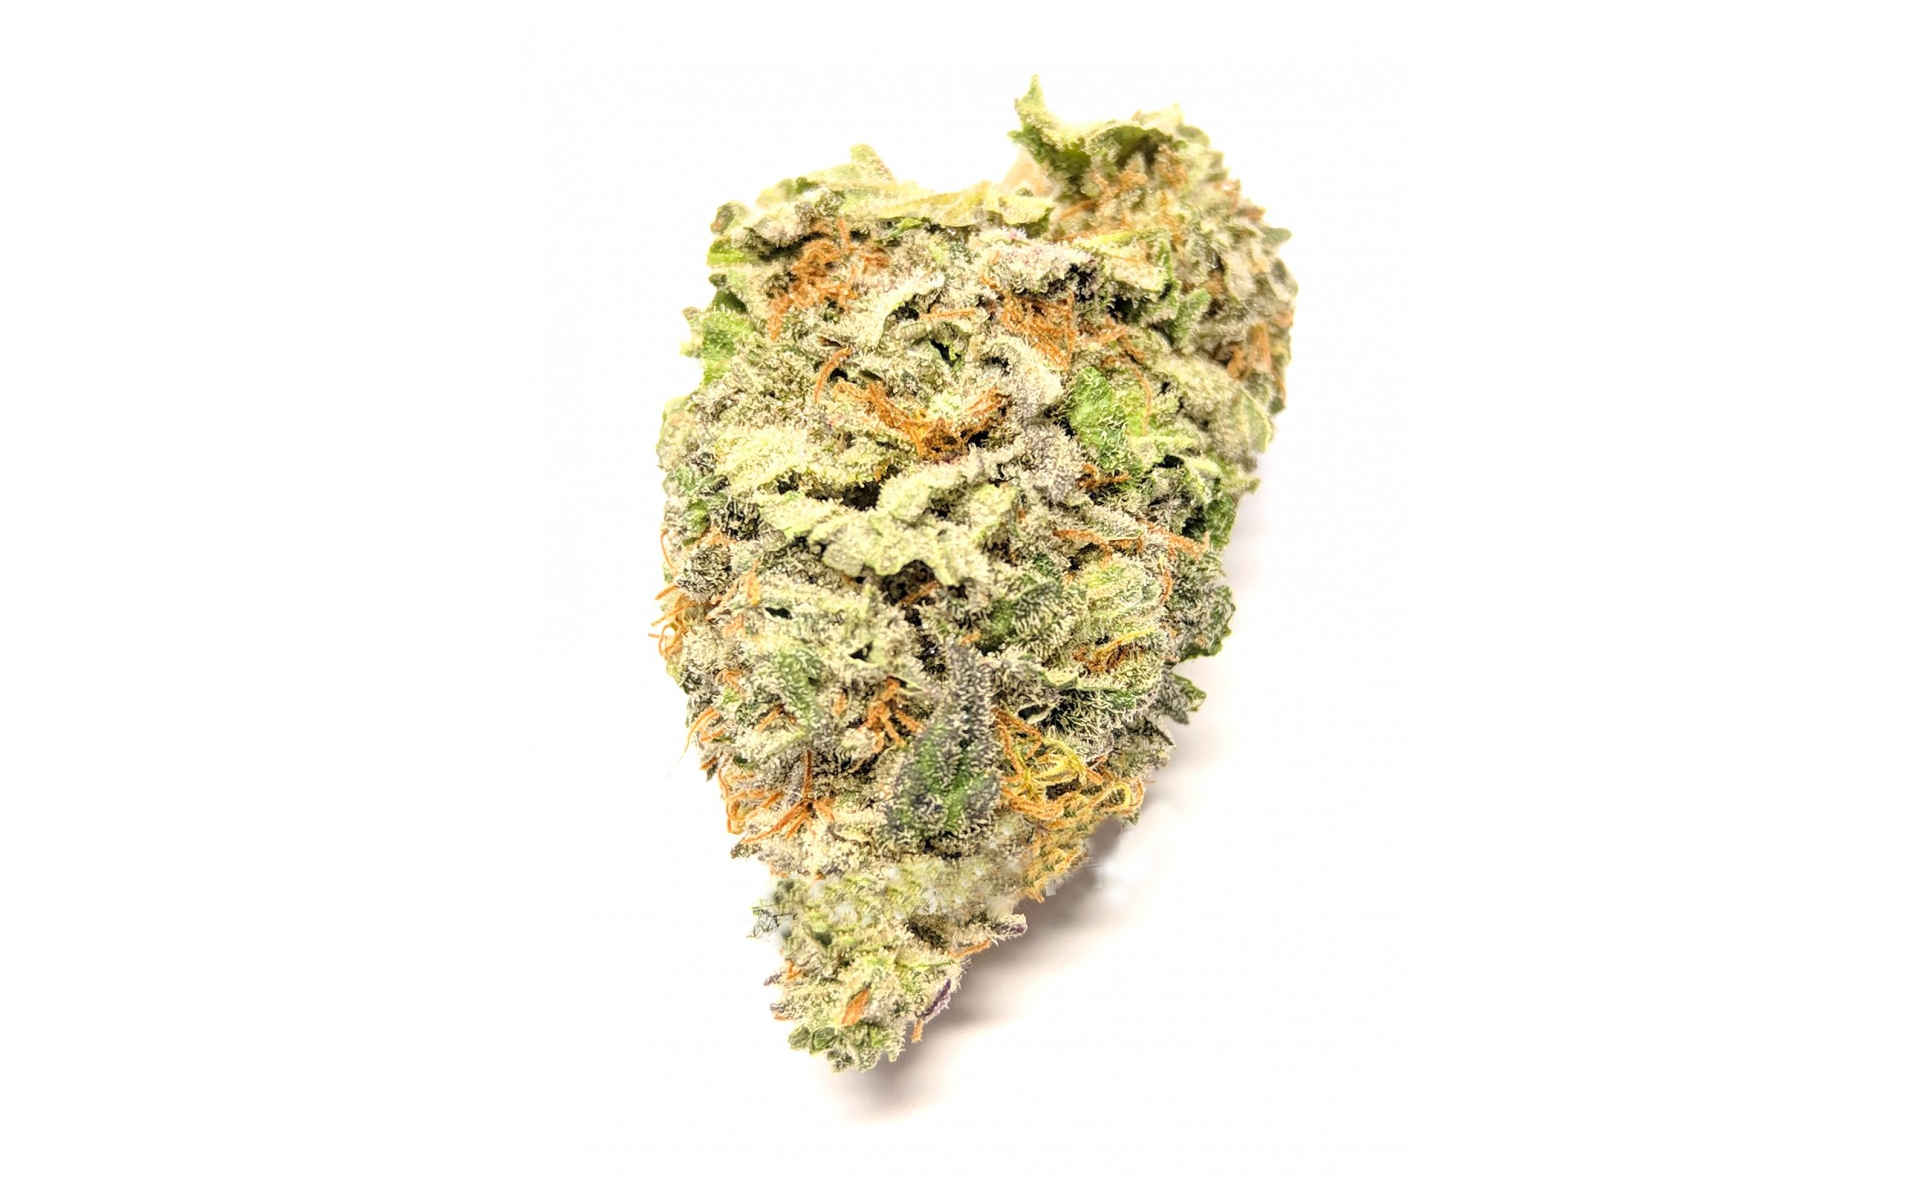 Cheese Dinafem najlepsza odmiana marihuany